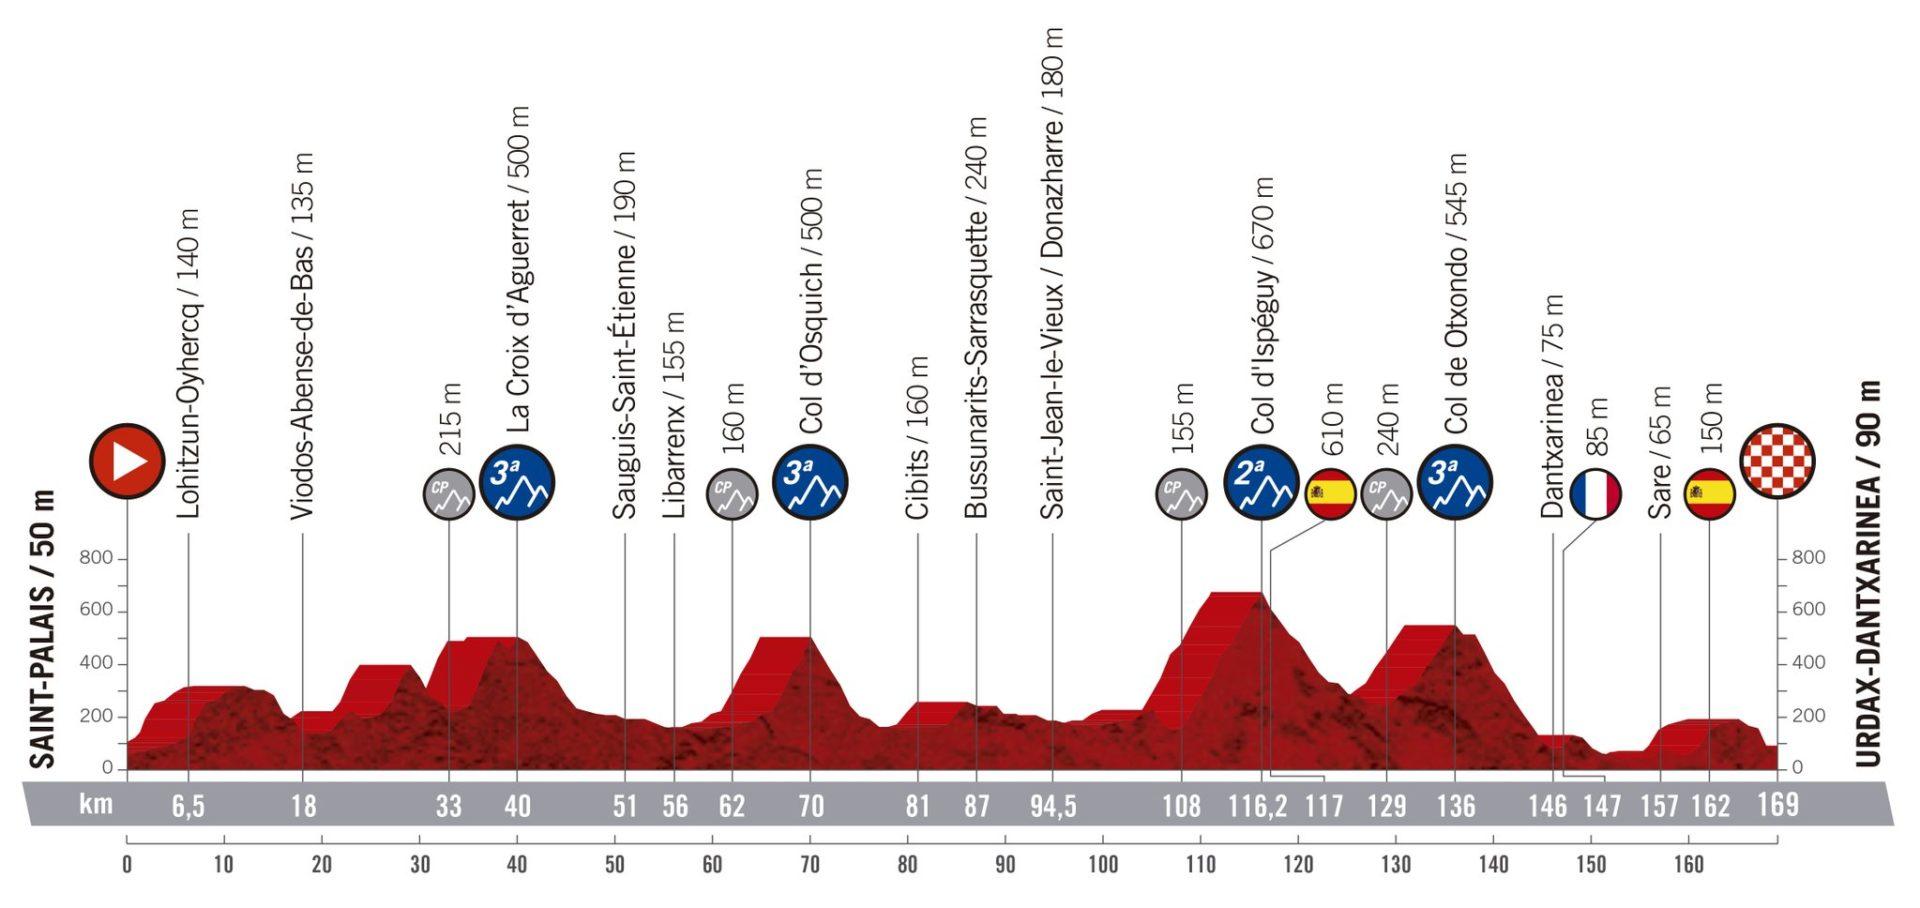 Saint Palais - Urdax Dantxarinea. La Vuelta 2019